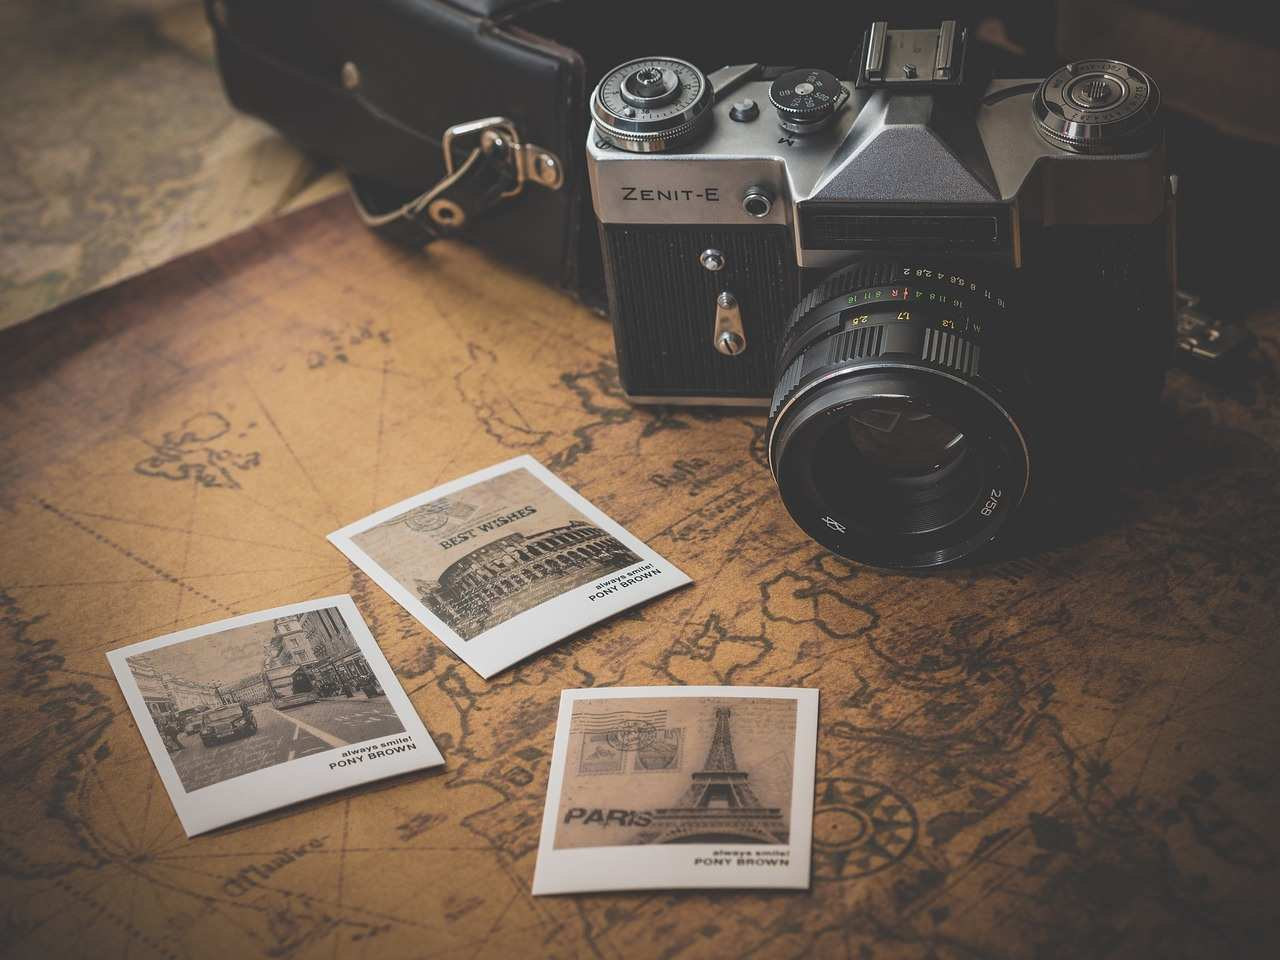 alte Foto-Kamera